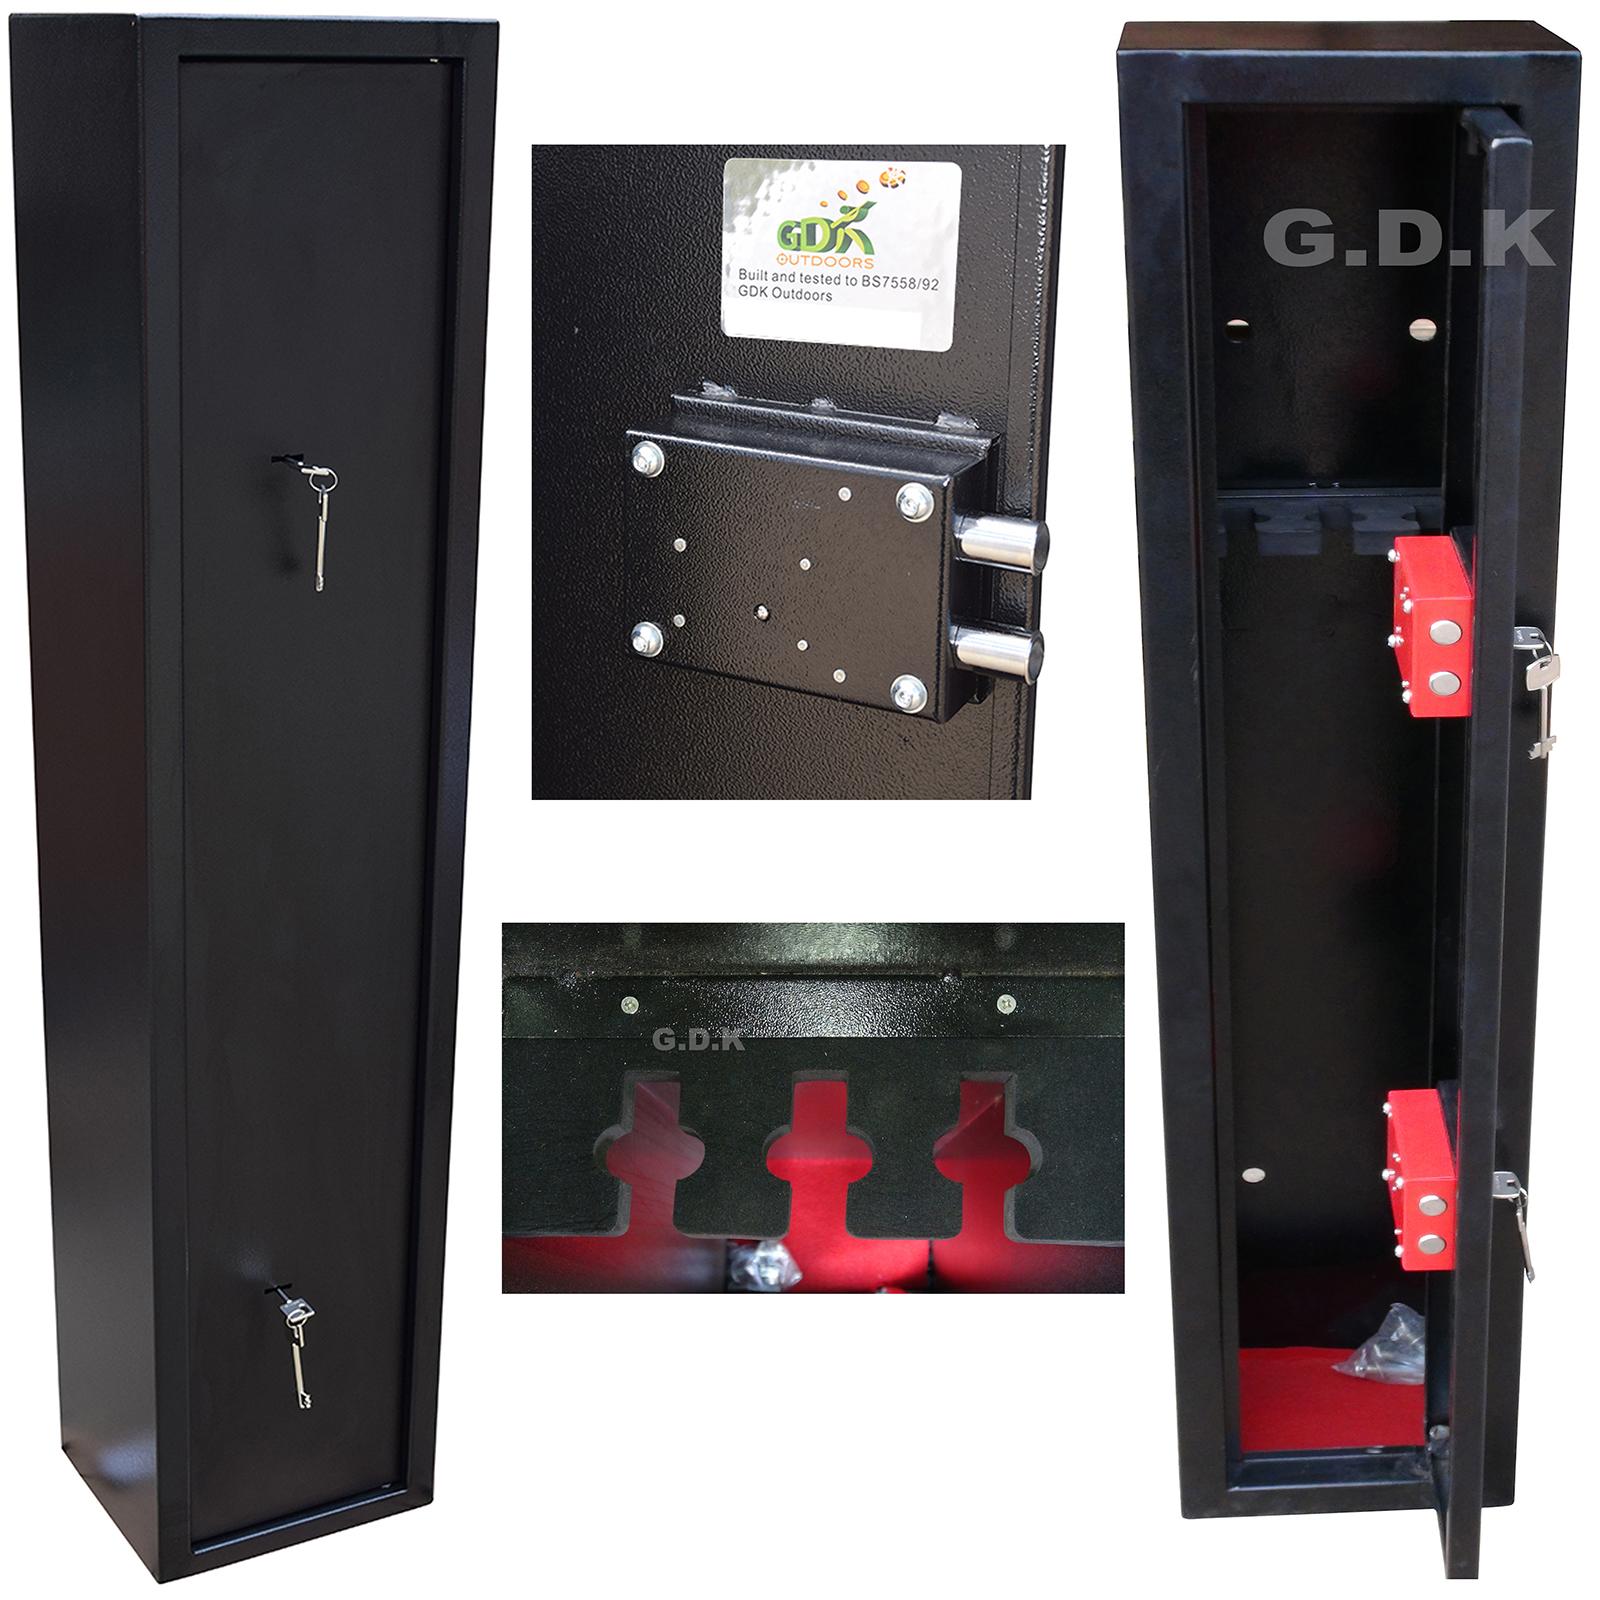 Main image 3 gun cabinet.